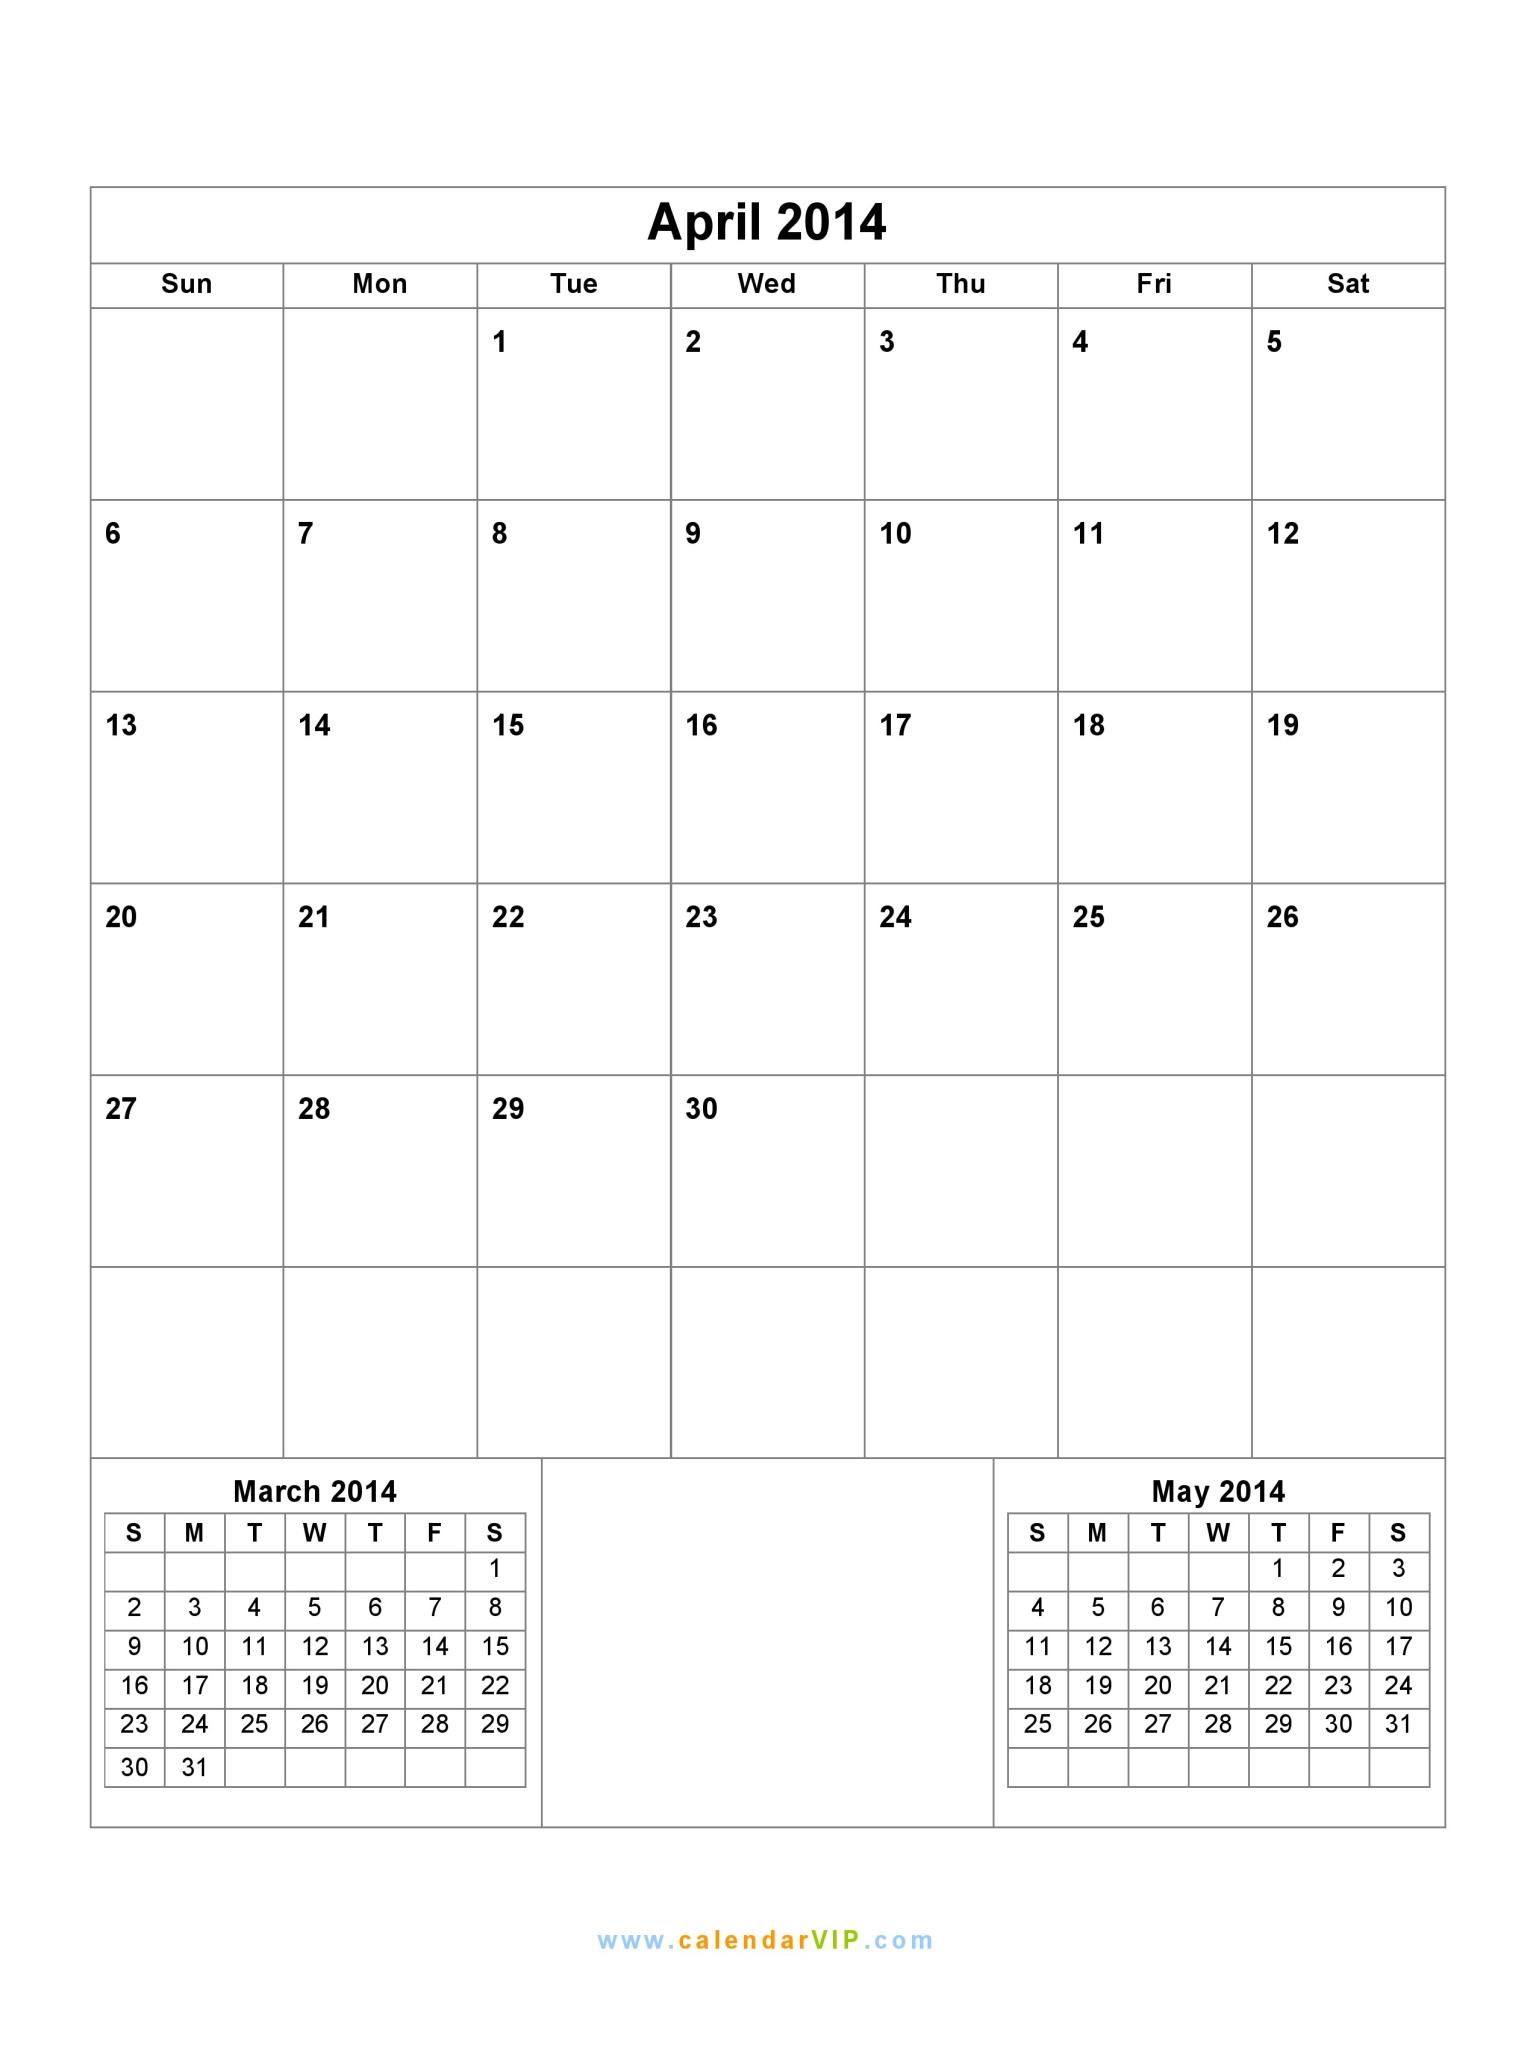 Calendar April 2014 : April calendar blank printable template in